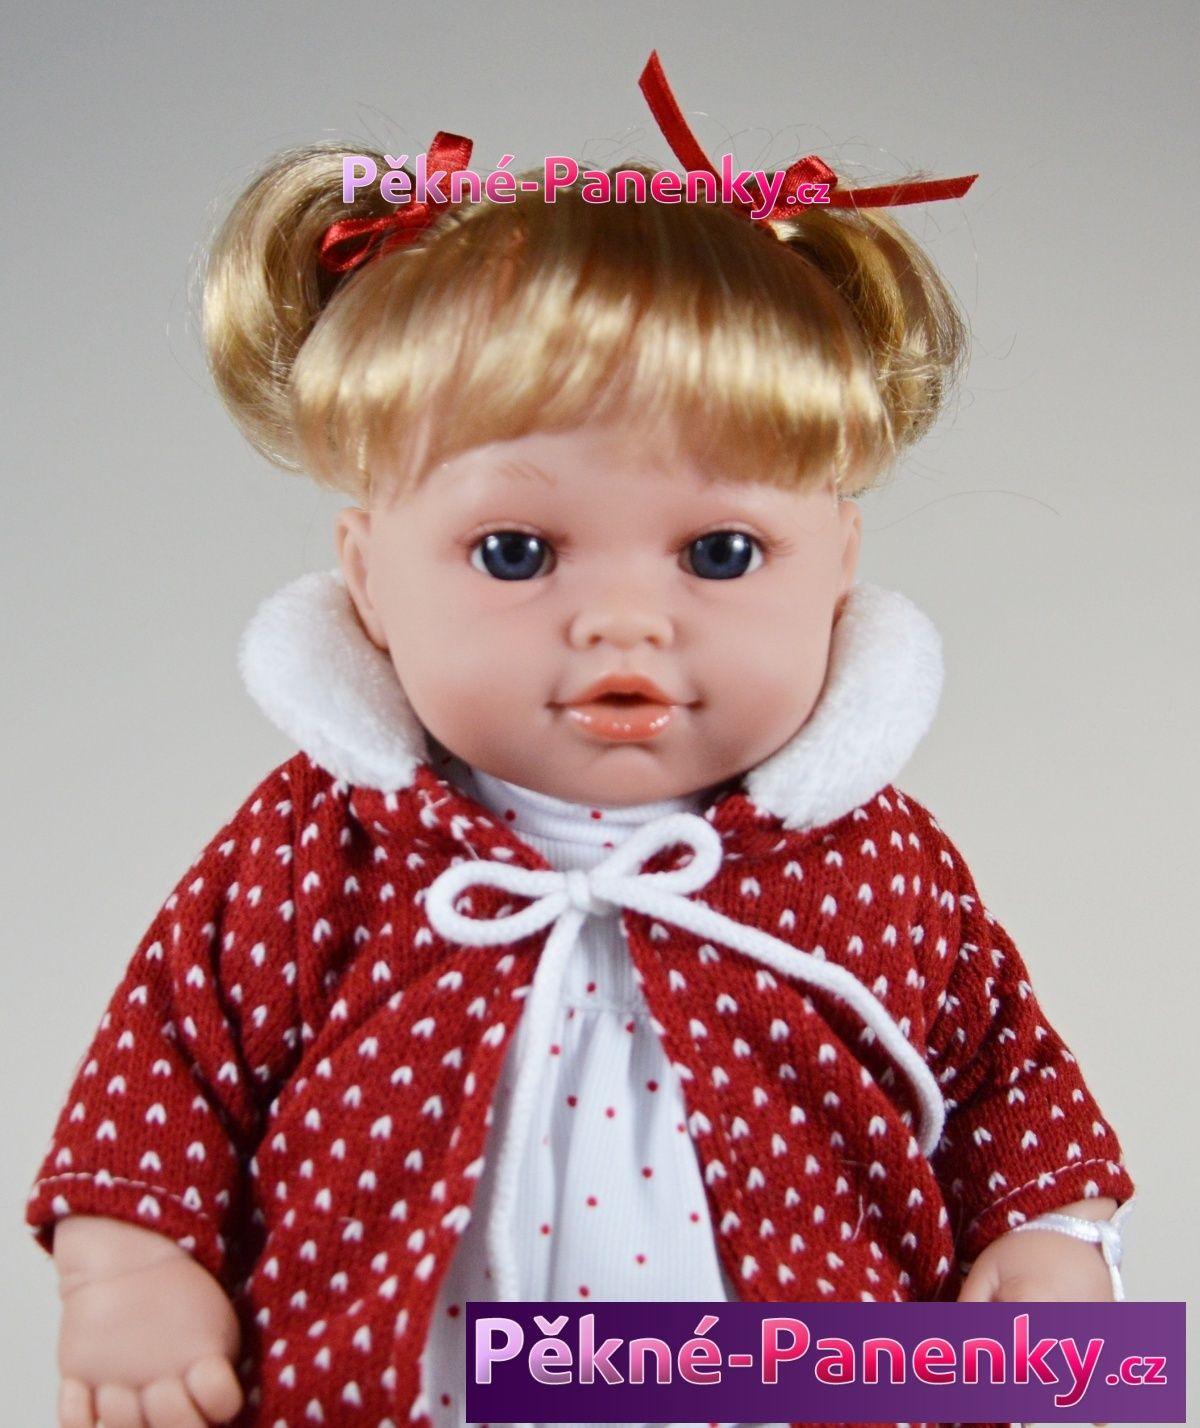 mluvící panenky s dudlíkem